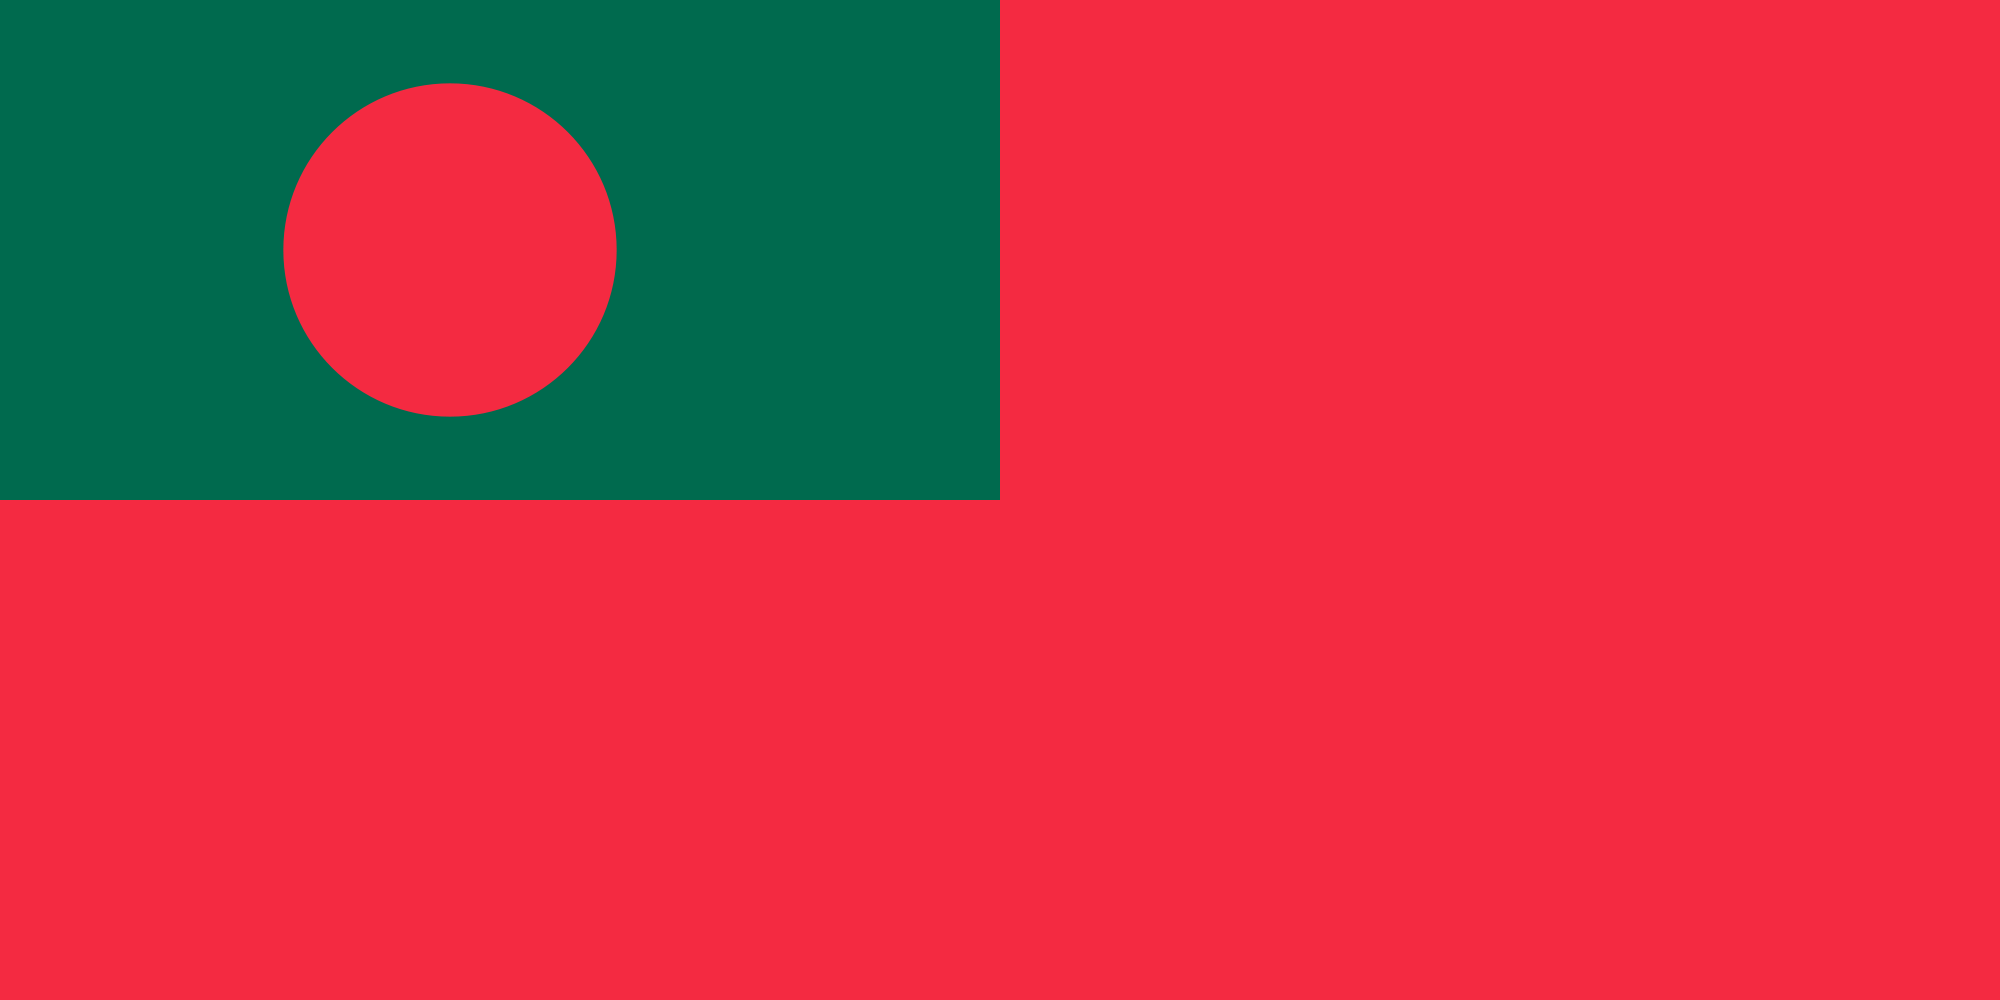 Bangladesh (Civil ensign)